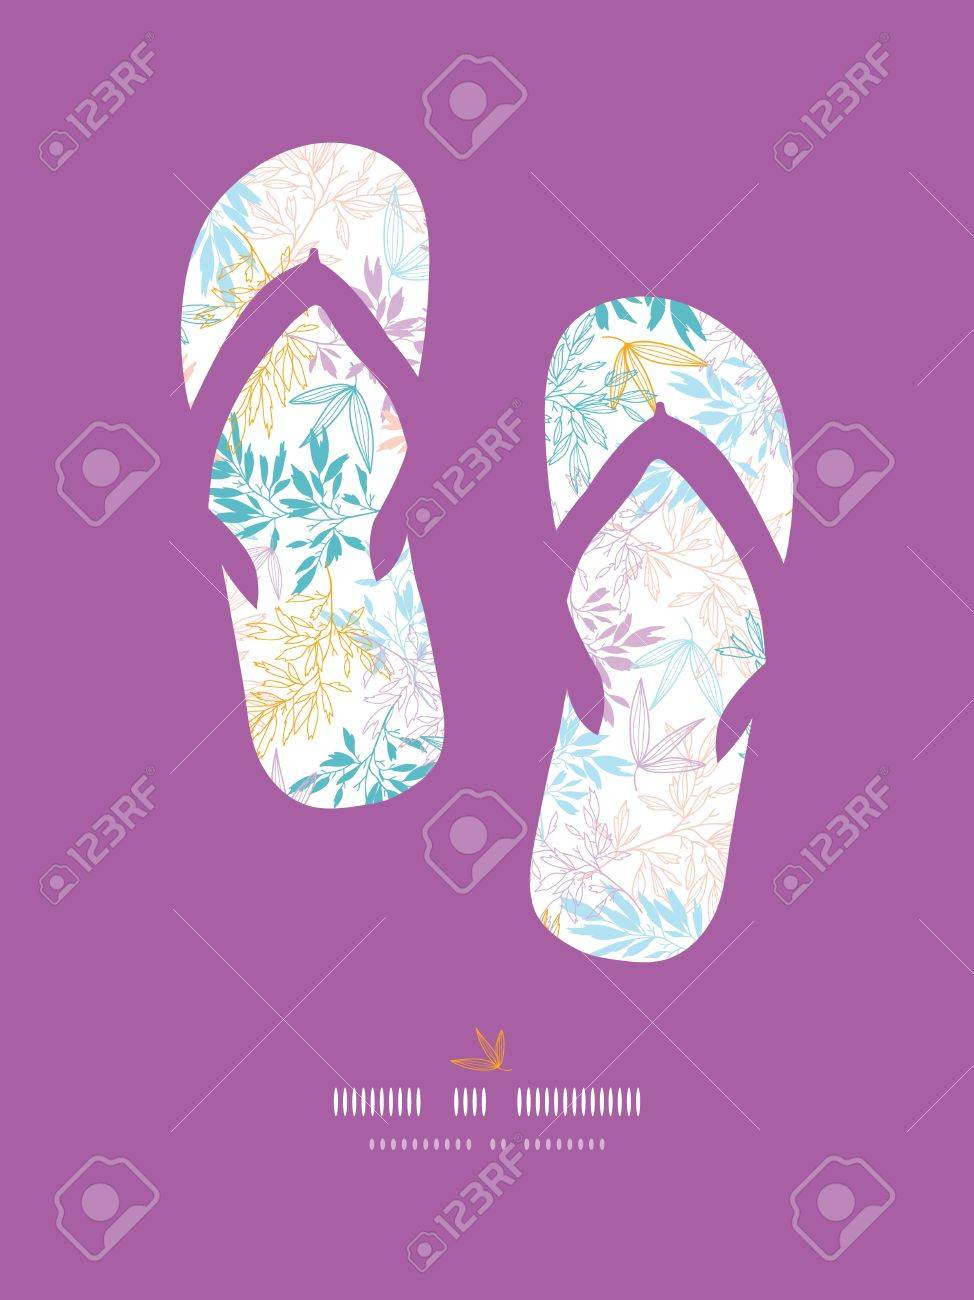 Colorful pastel branches flip-flops decor pattern background - 18116417